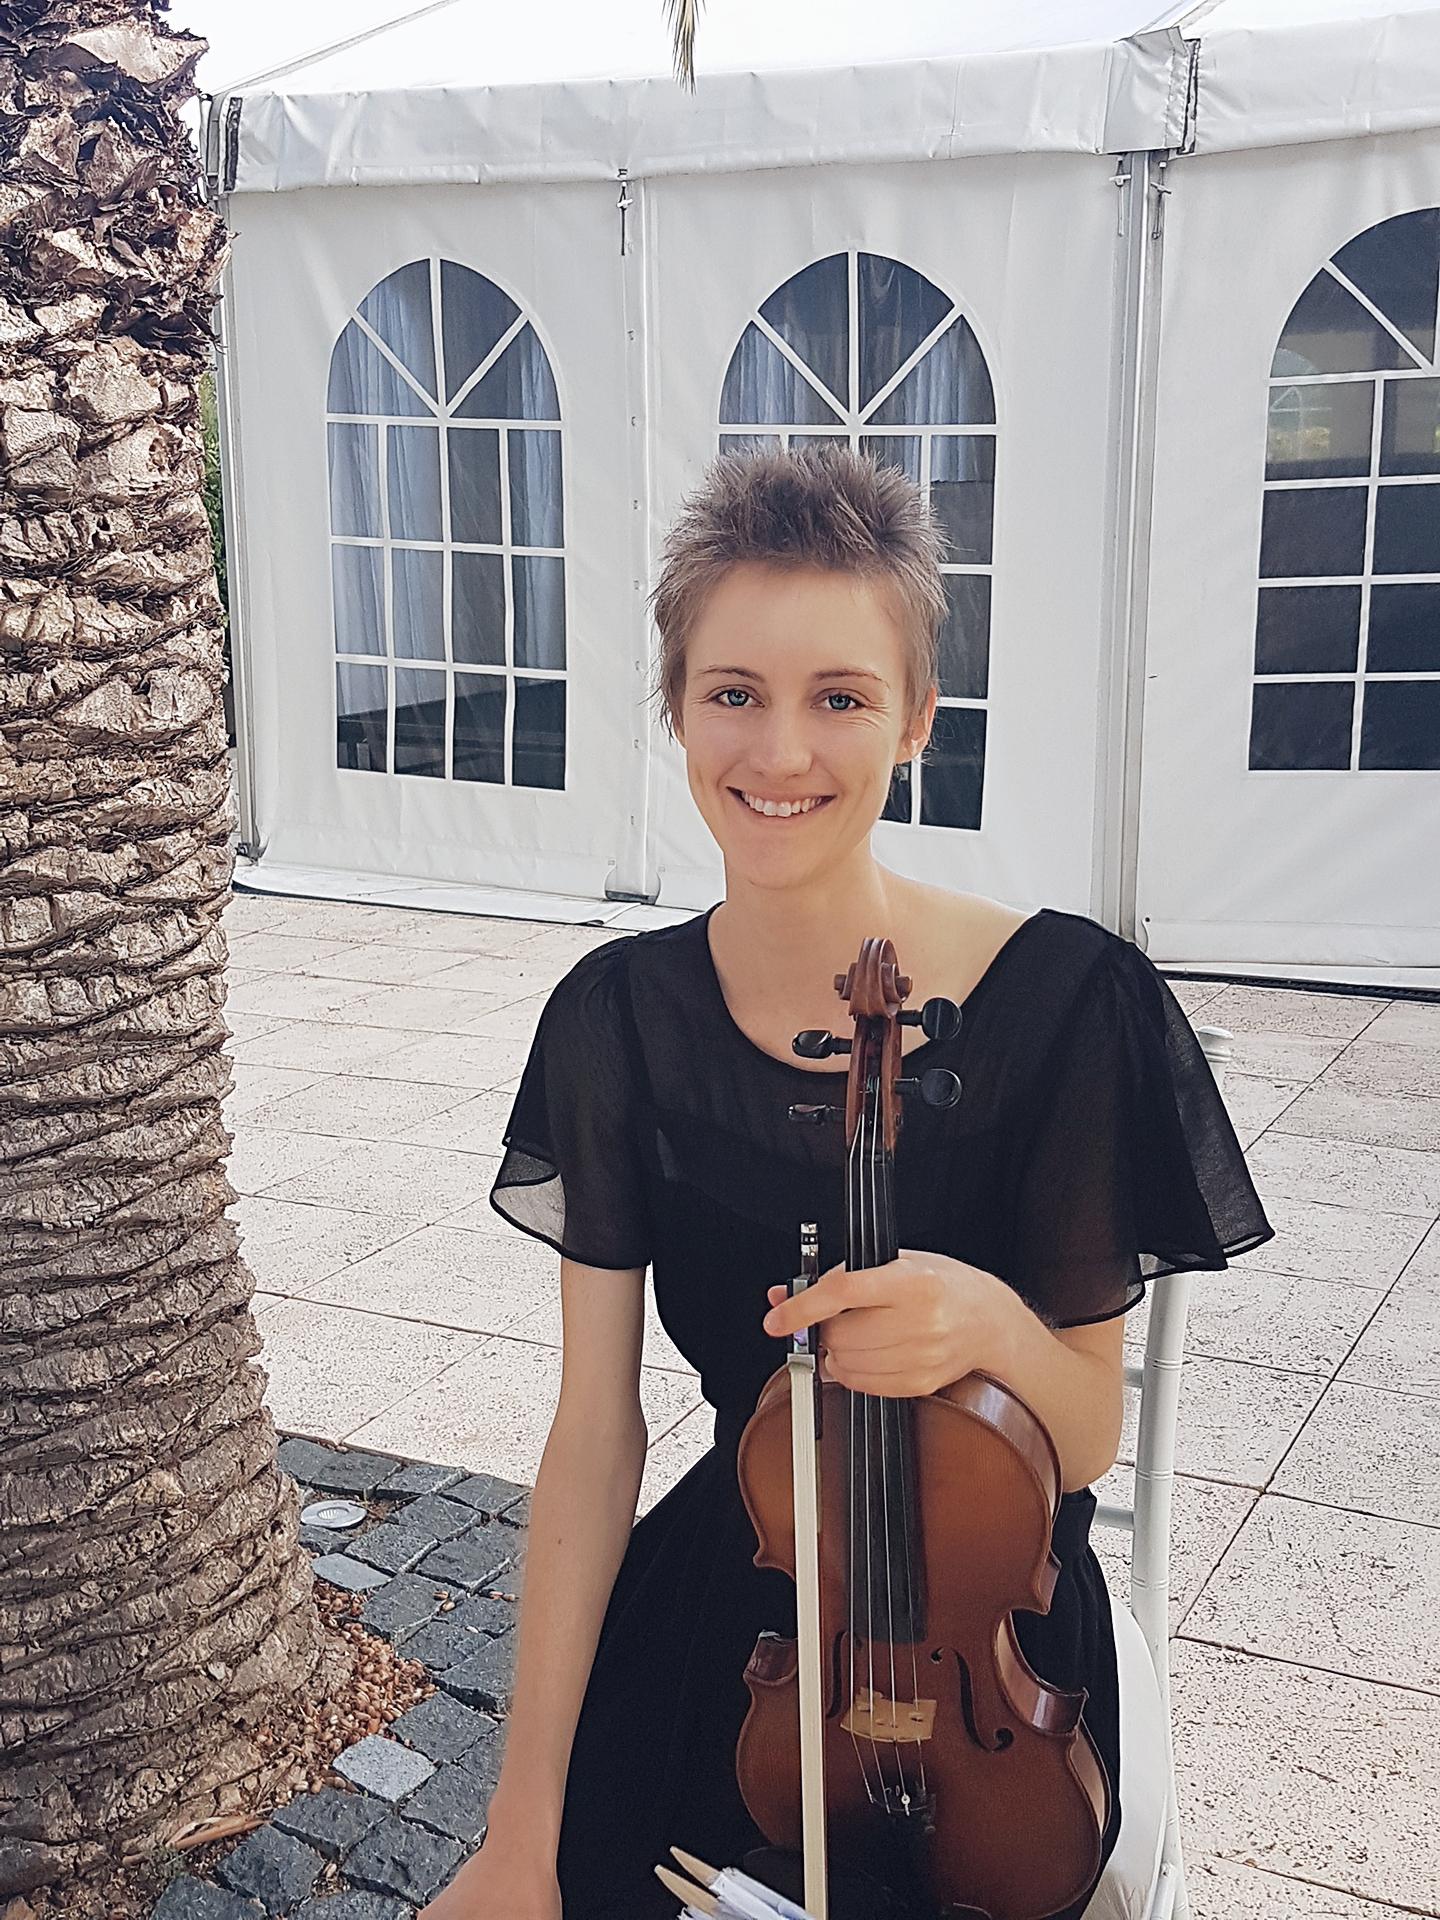 perth-function-string-music-hire-wedding-riverside-musiciansperth-function-string-music-hire-wedding-riverside-musicians-classical-contemporary-violin-solo-violinist